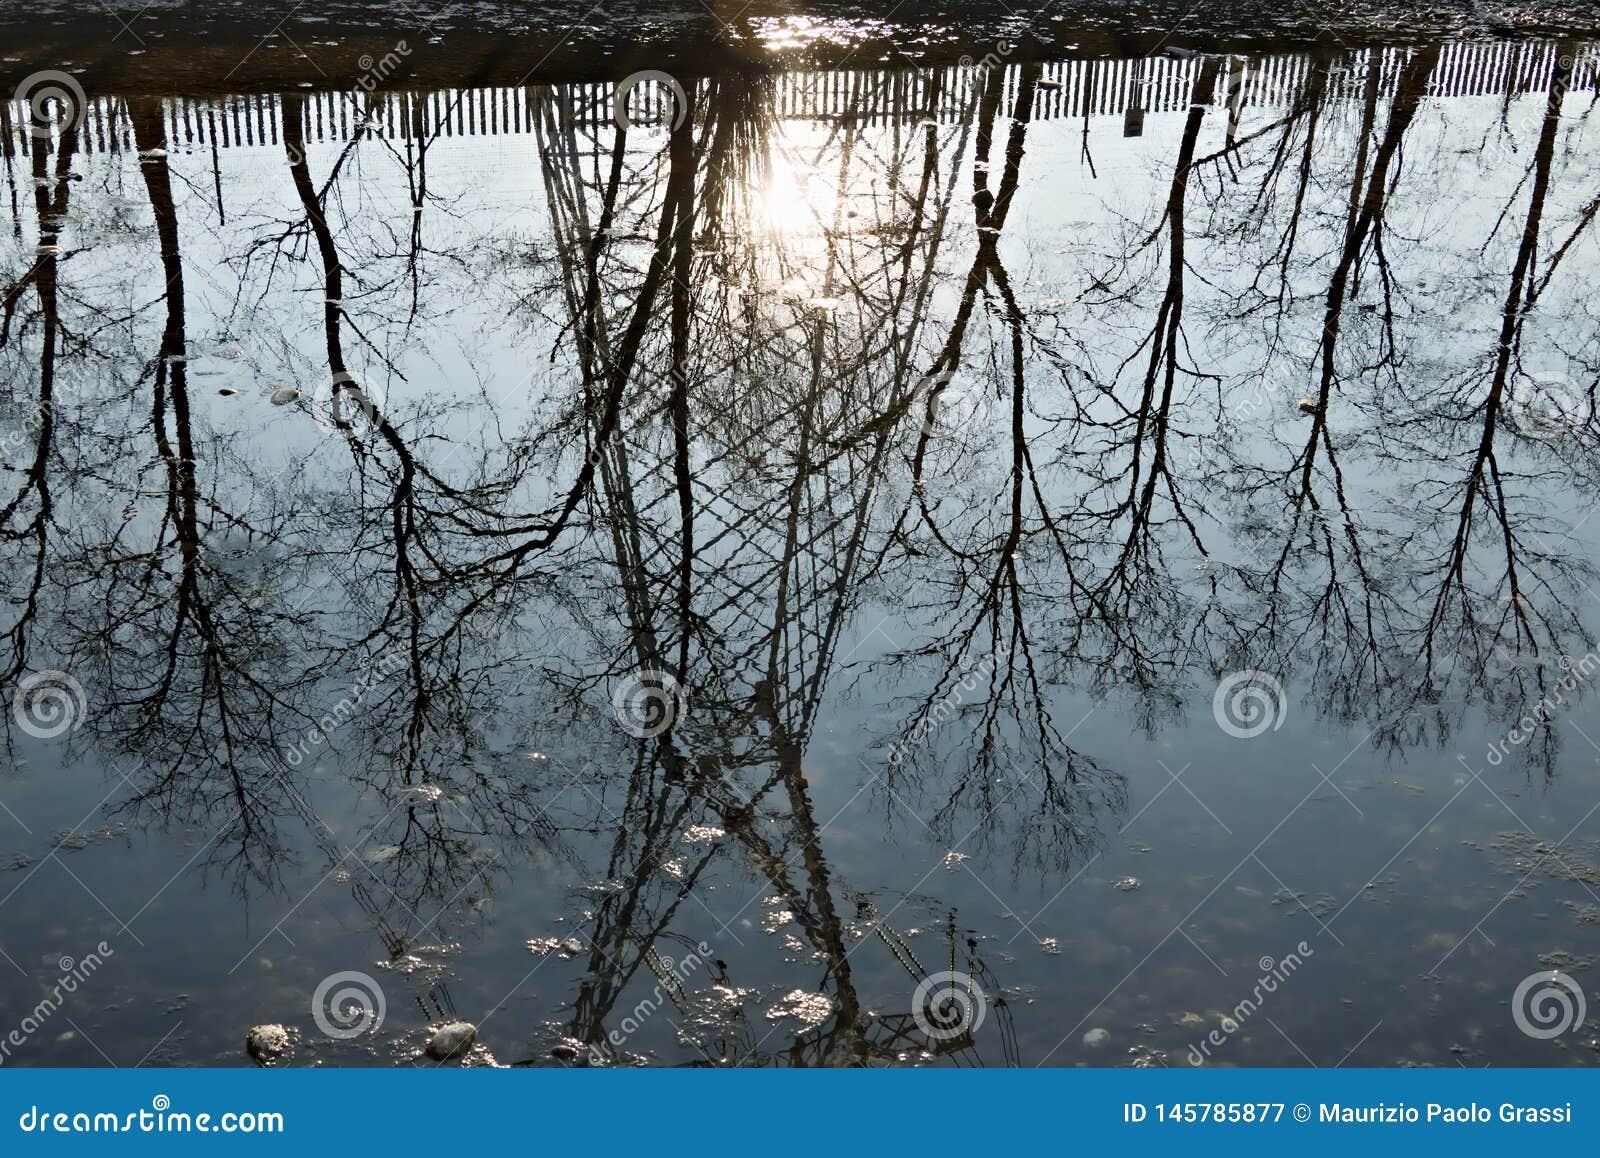 Turbigo Μιλάνο Λομβαρδία r Αντανάκλαση trellis στο νερό του ποταμού Naviglio Grande